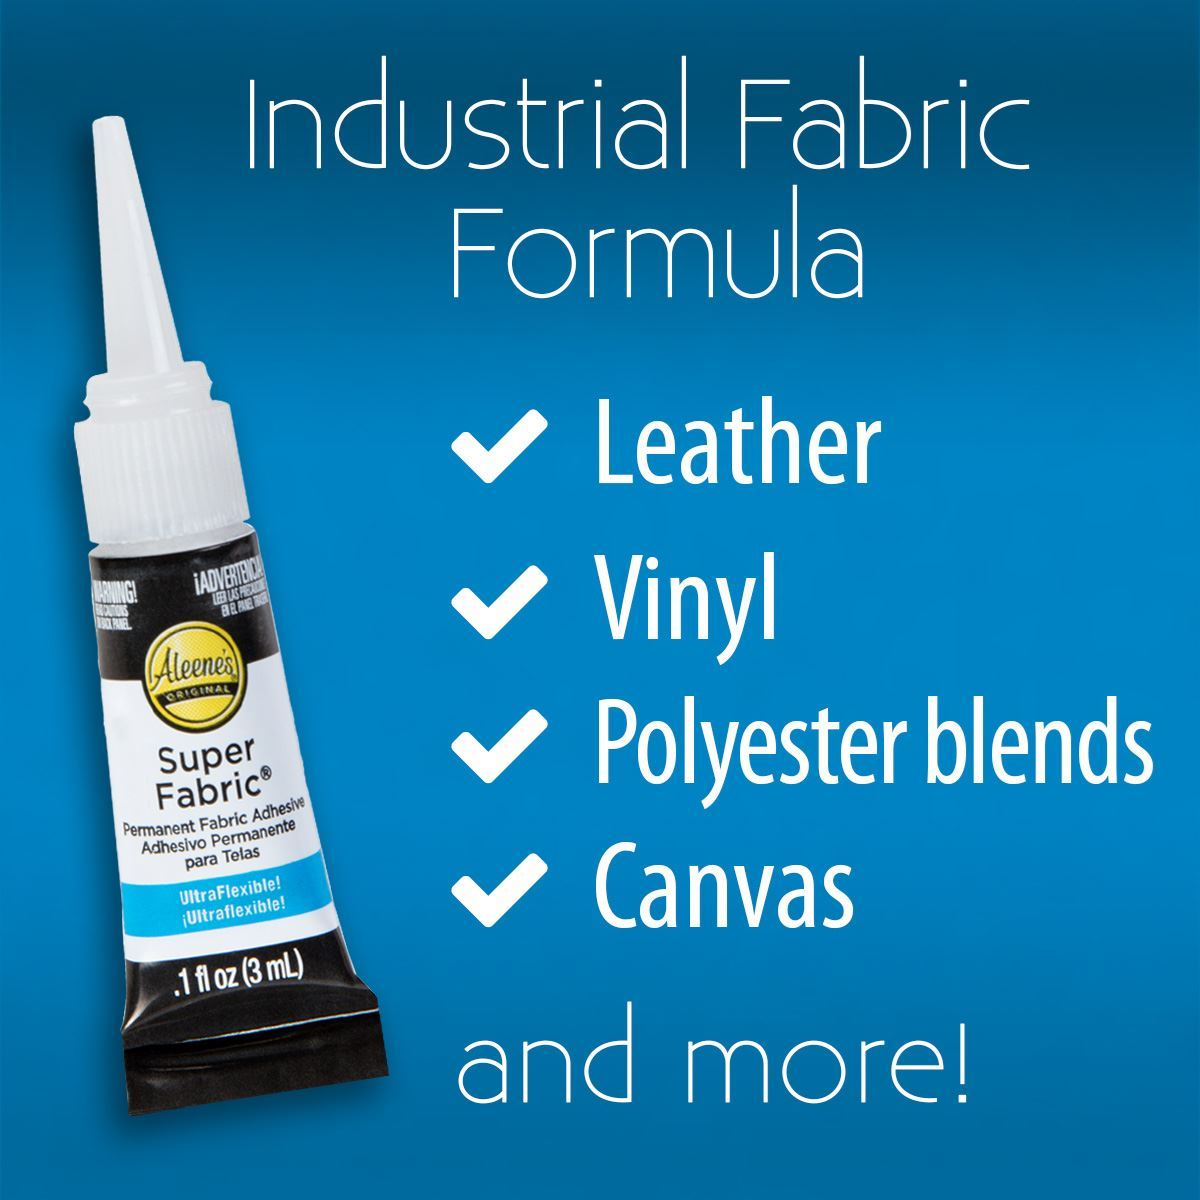 Aleene's Super Fabric Surfaces